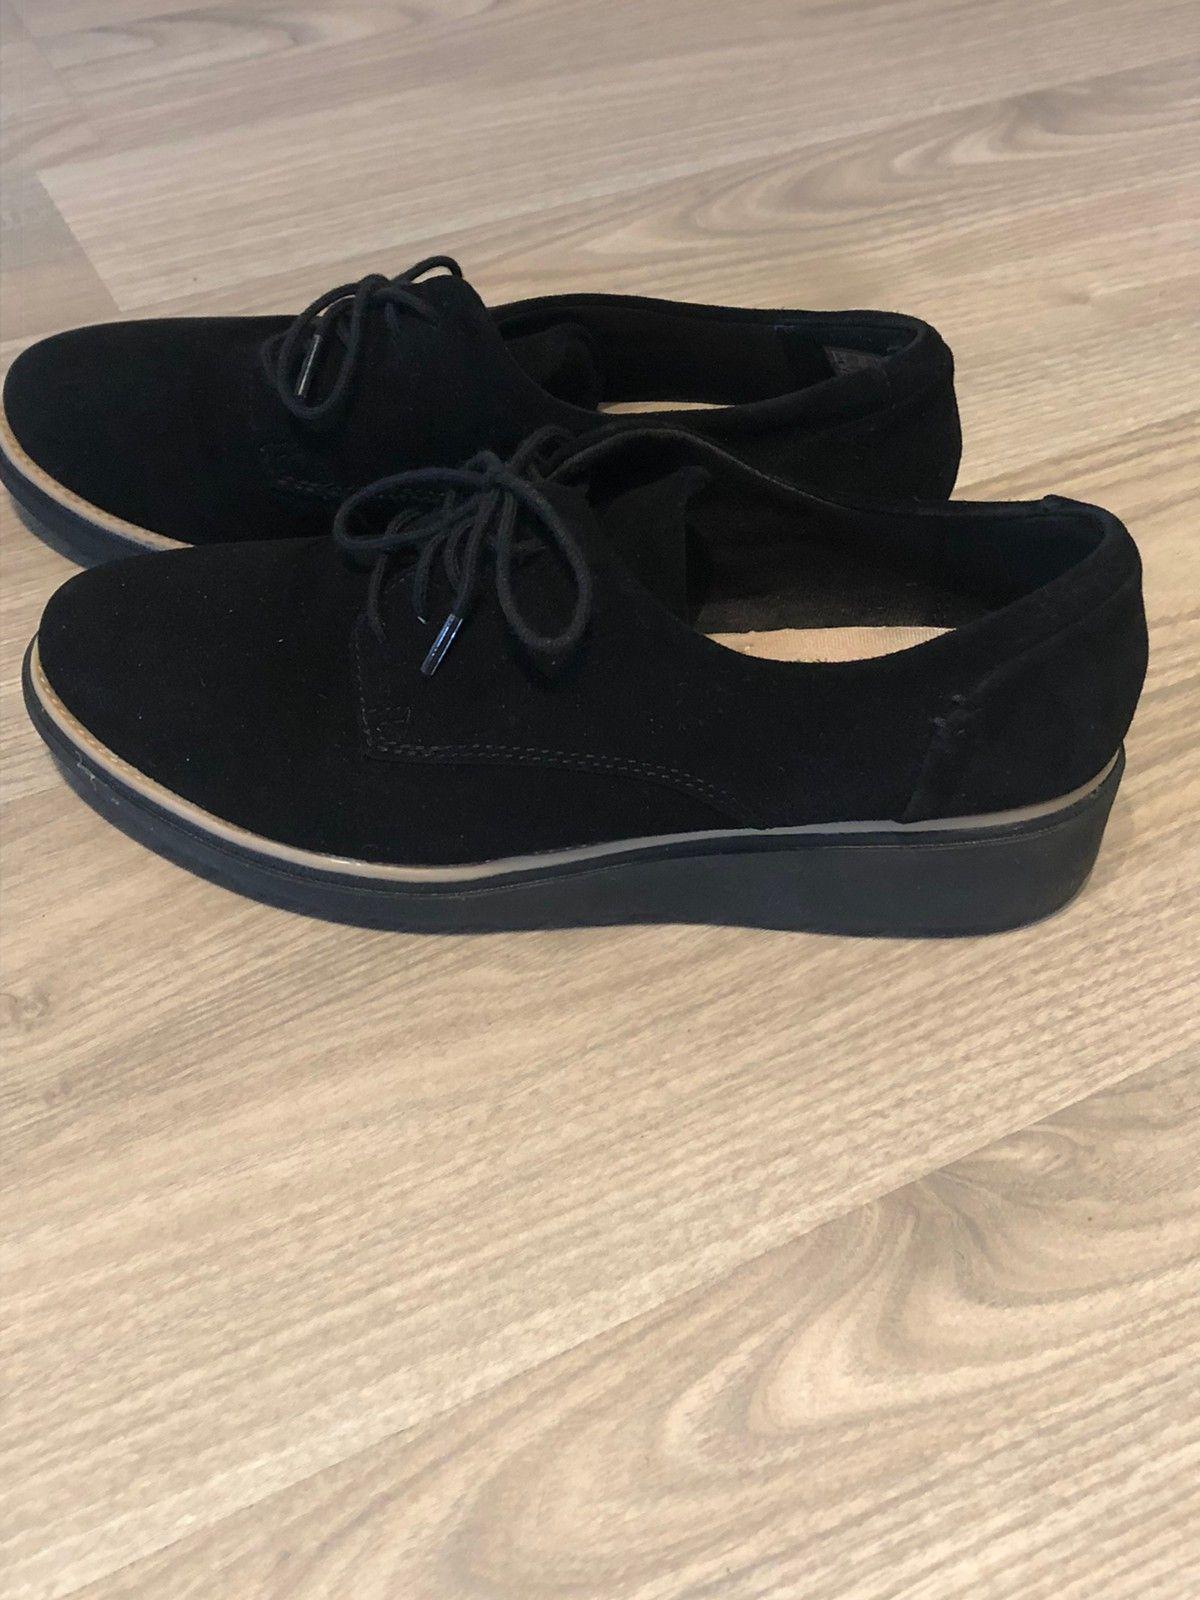 Clarks sko selges | FINN.no